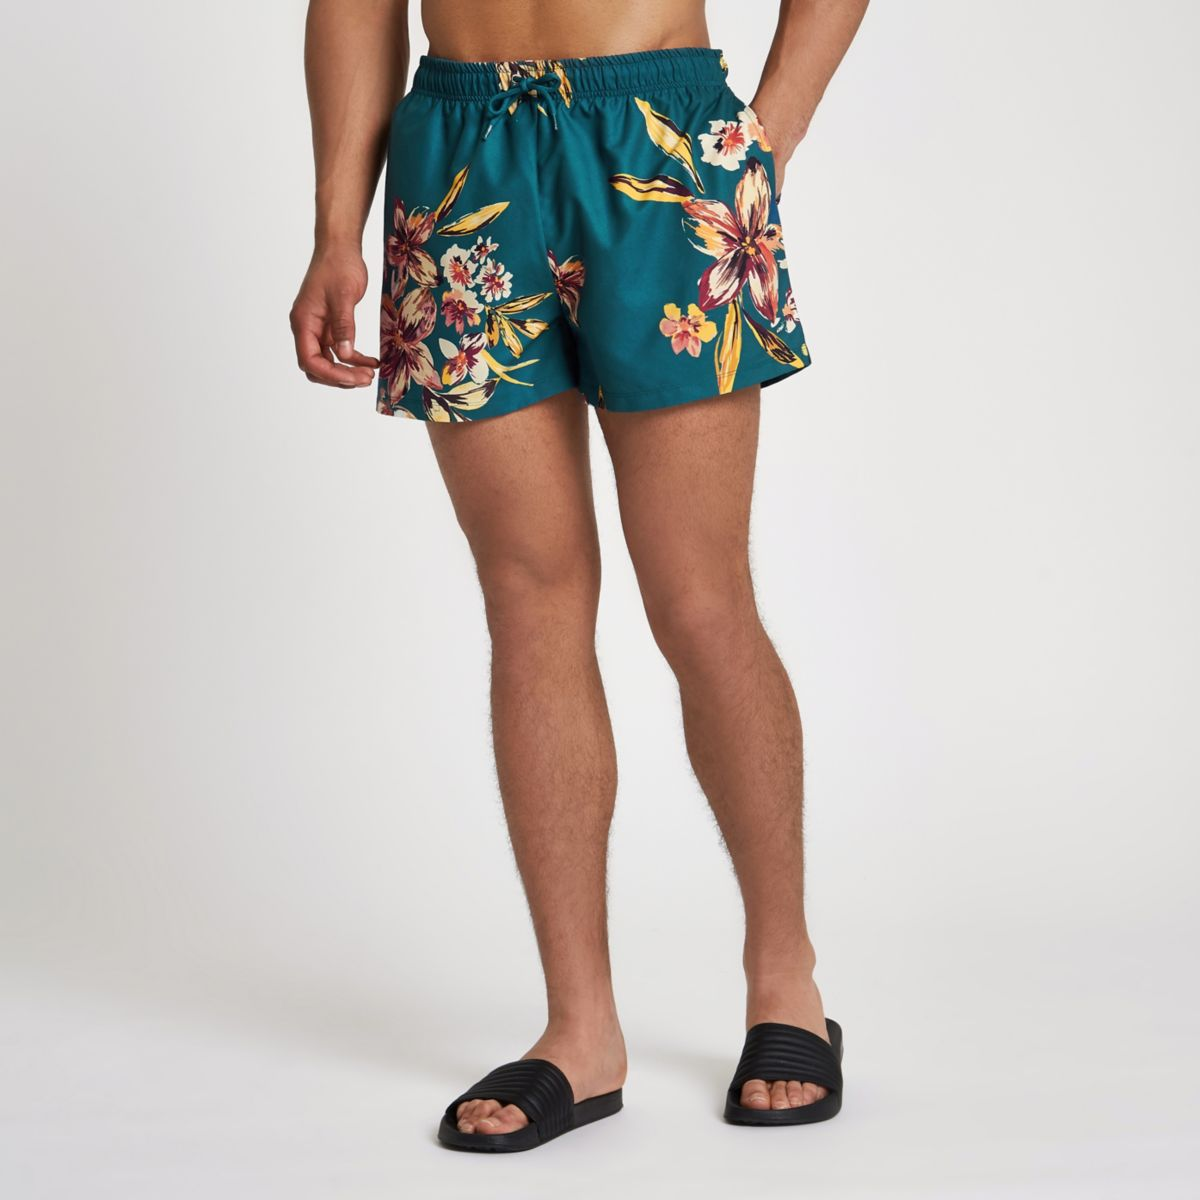 Teal floral print swim shorts